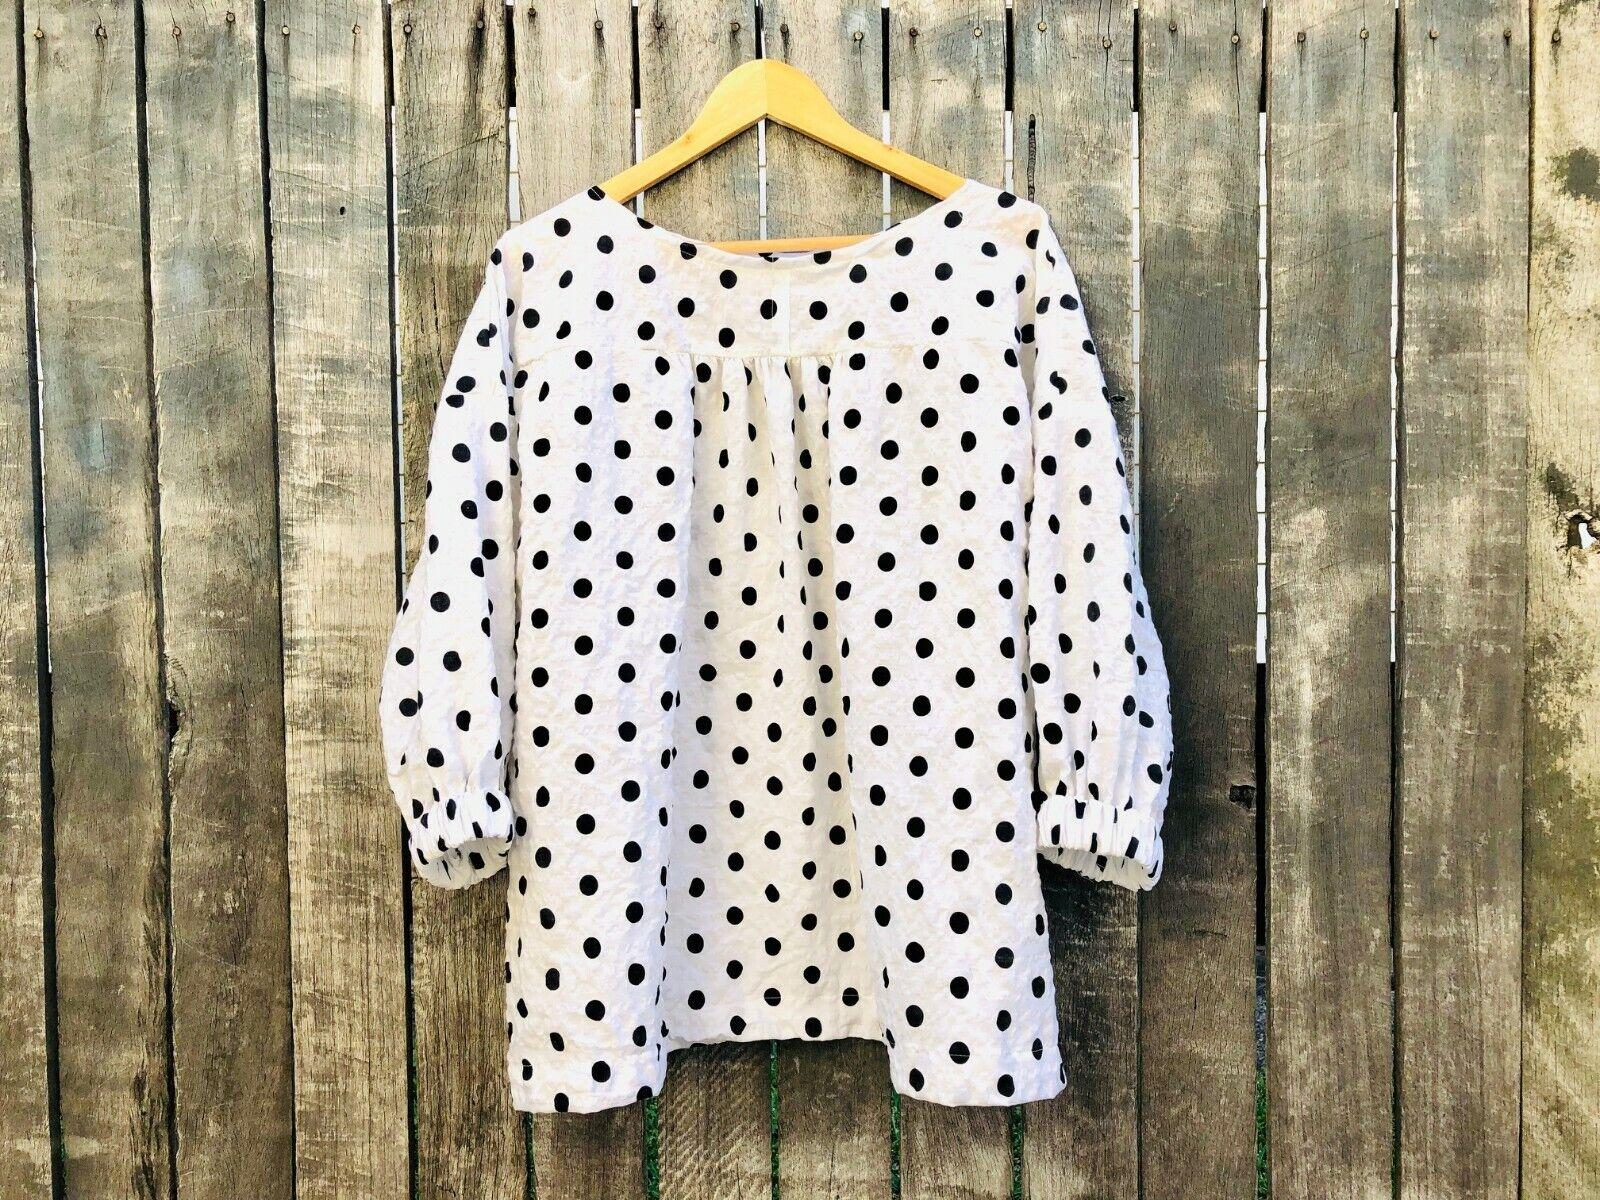 White Polka Dot Marta Blouse one size fits all plus size over 50 fashion